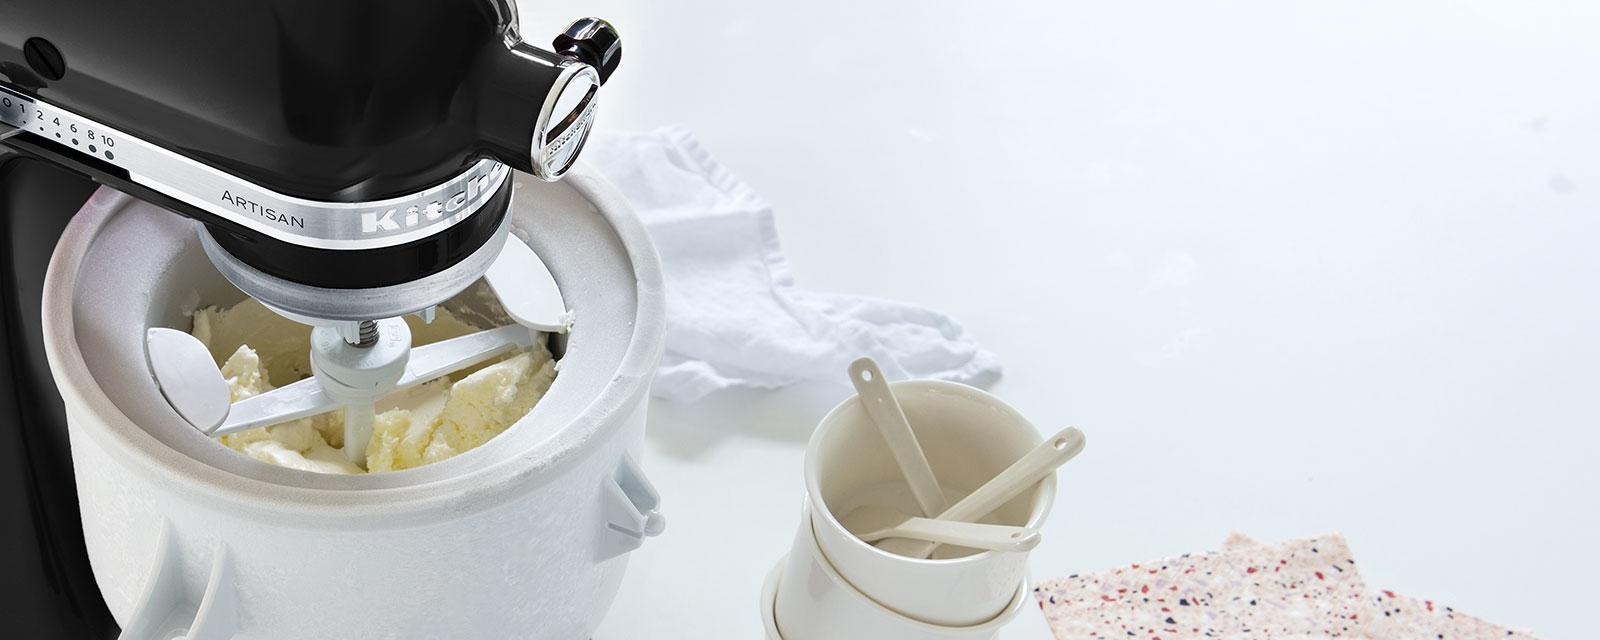 Ice cream maker on black mixer making vanilla ice cream